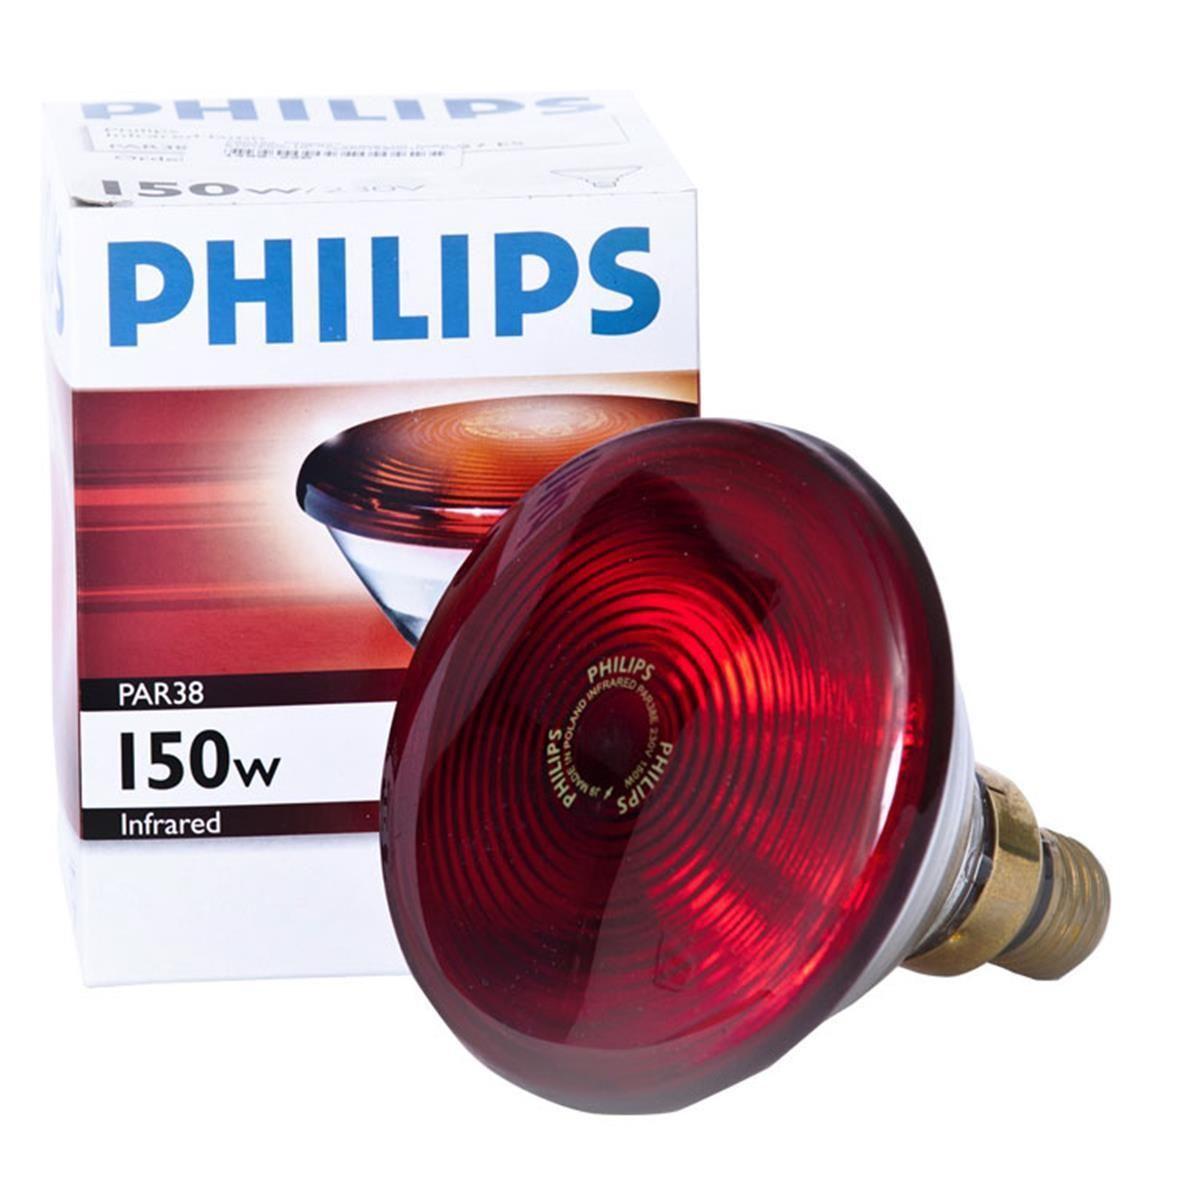 Lâmpada de Infra Vermelho 150 Watts - Marca:  PHILIPS  - HB FISIOTERAPIA